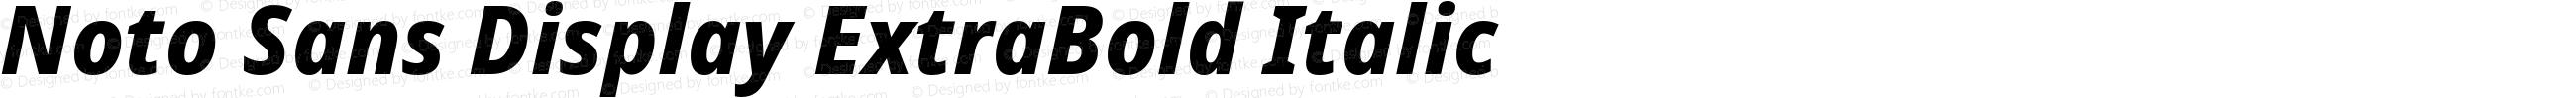 Noto Sans Display ExtraBold Italic